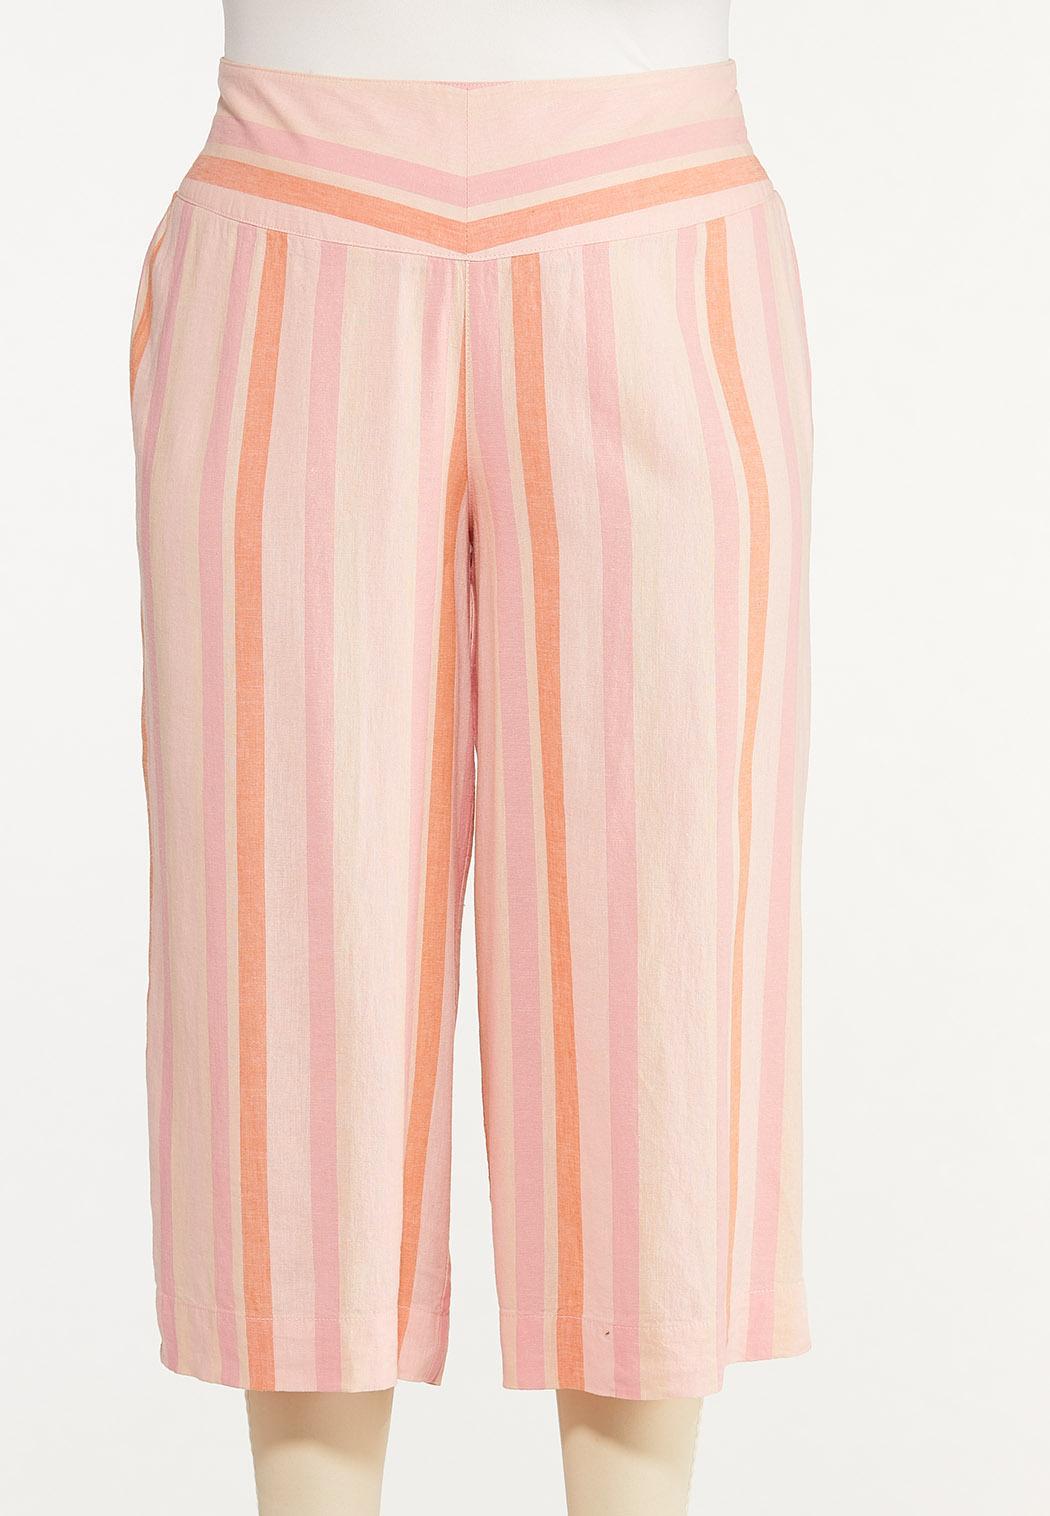 Plus Size Cropped Striped Linen Pants